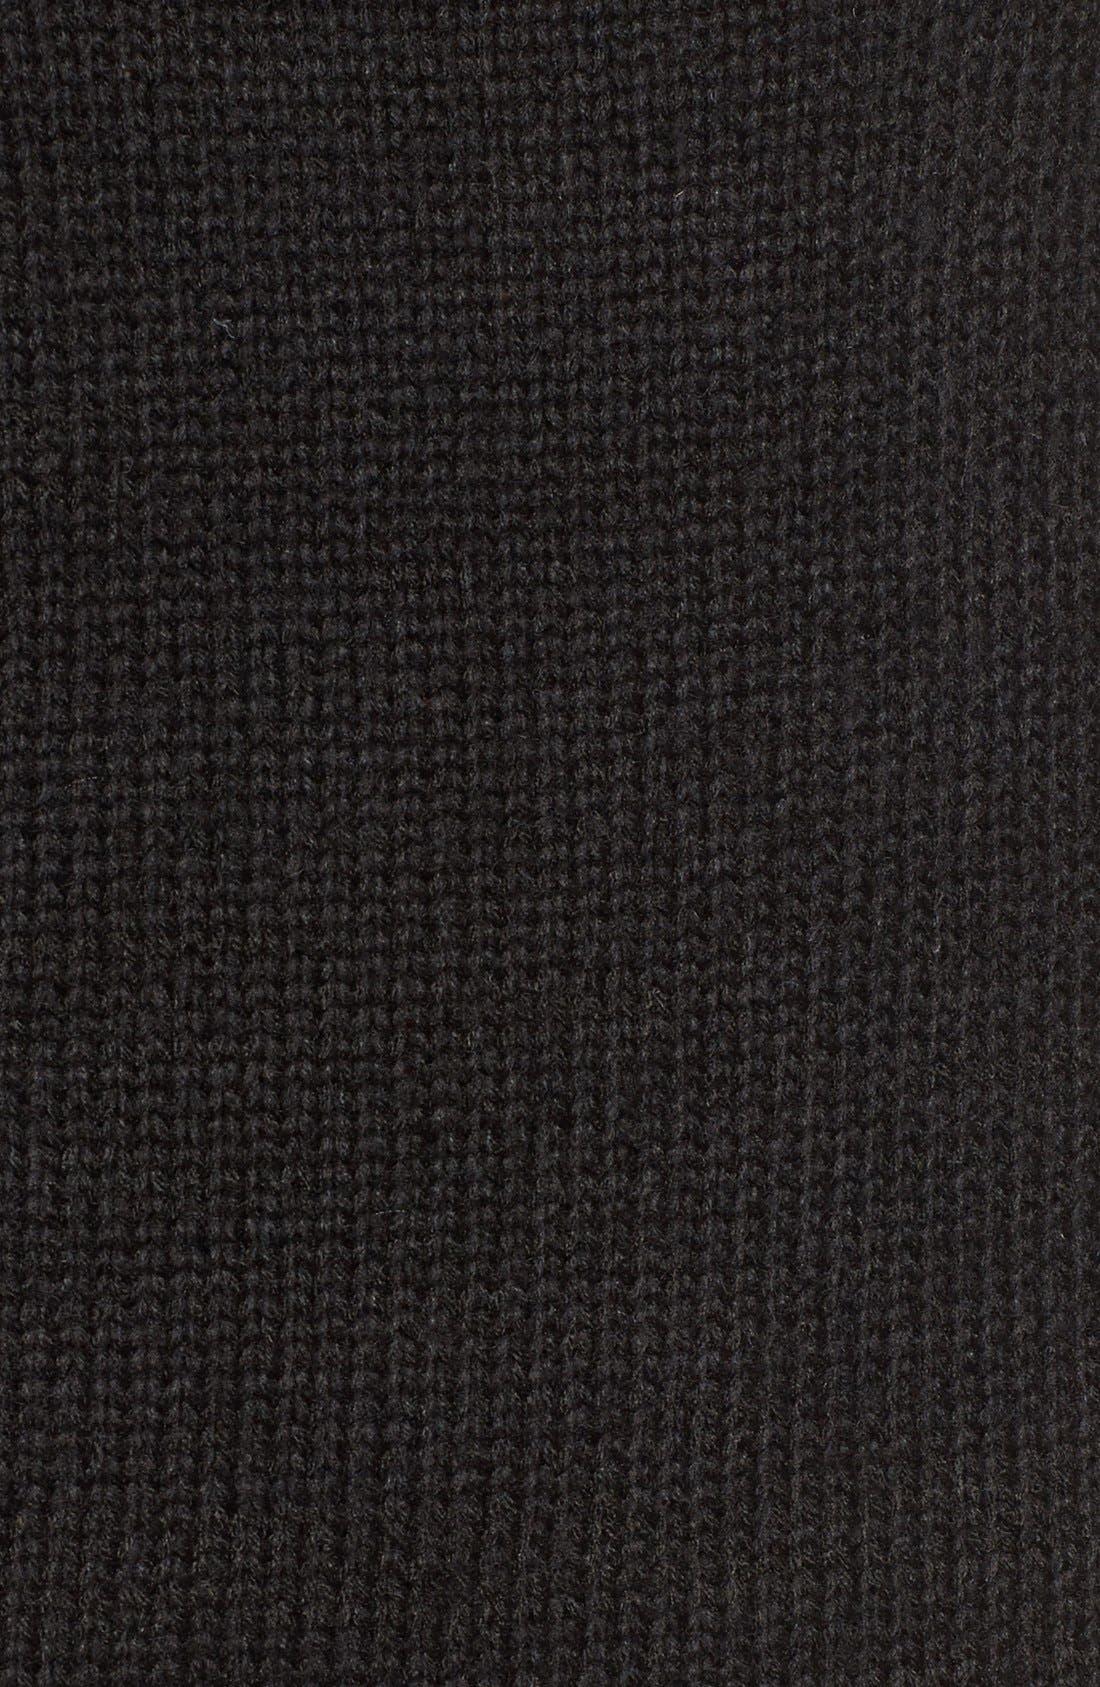 Turtleneck Sweater Dress,                             Alternate thumbnail 2, color,                             001